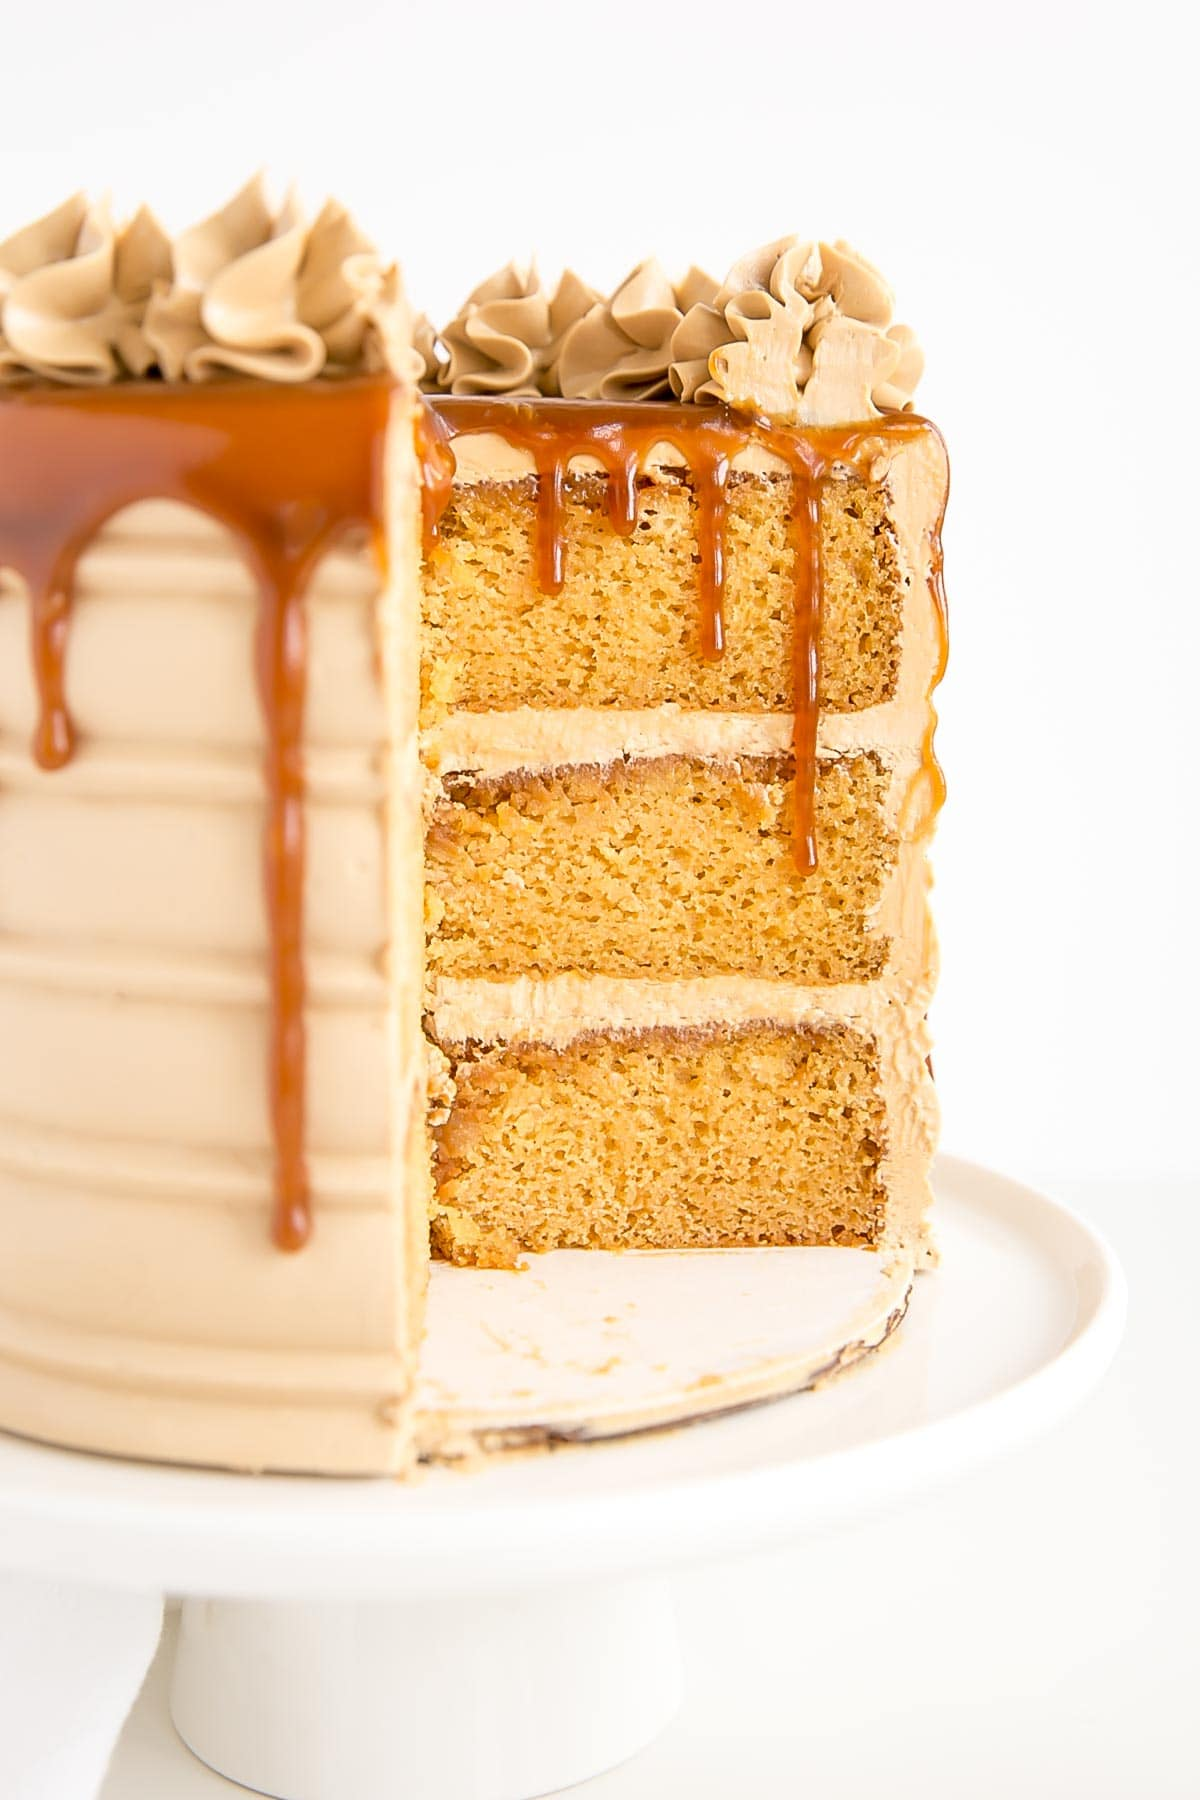 Caramel Cake Salted Caramel Cake Liv For Cake